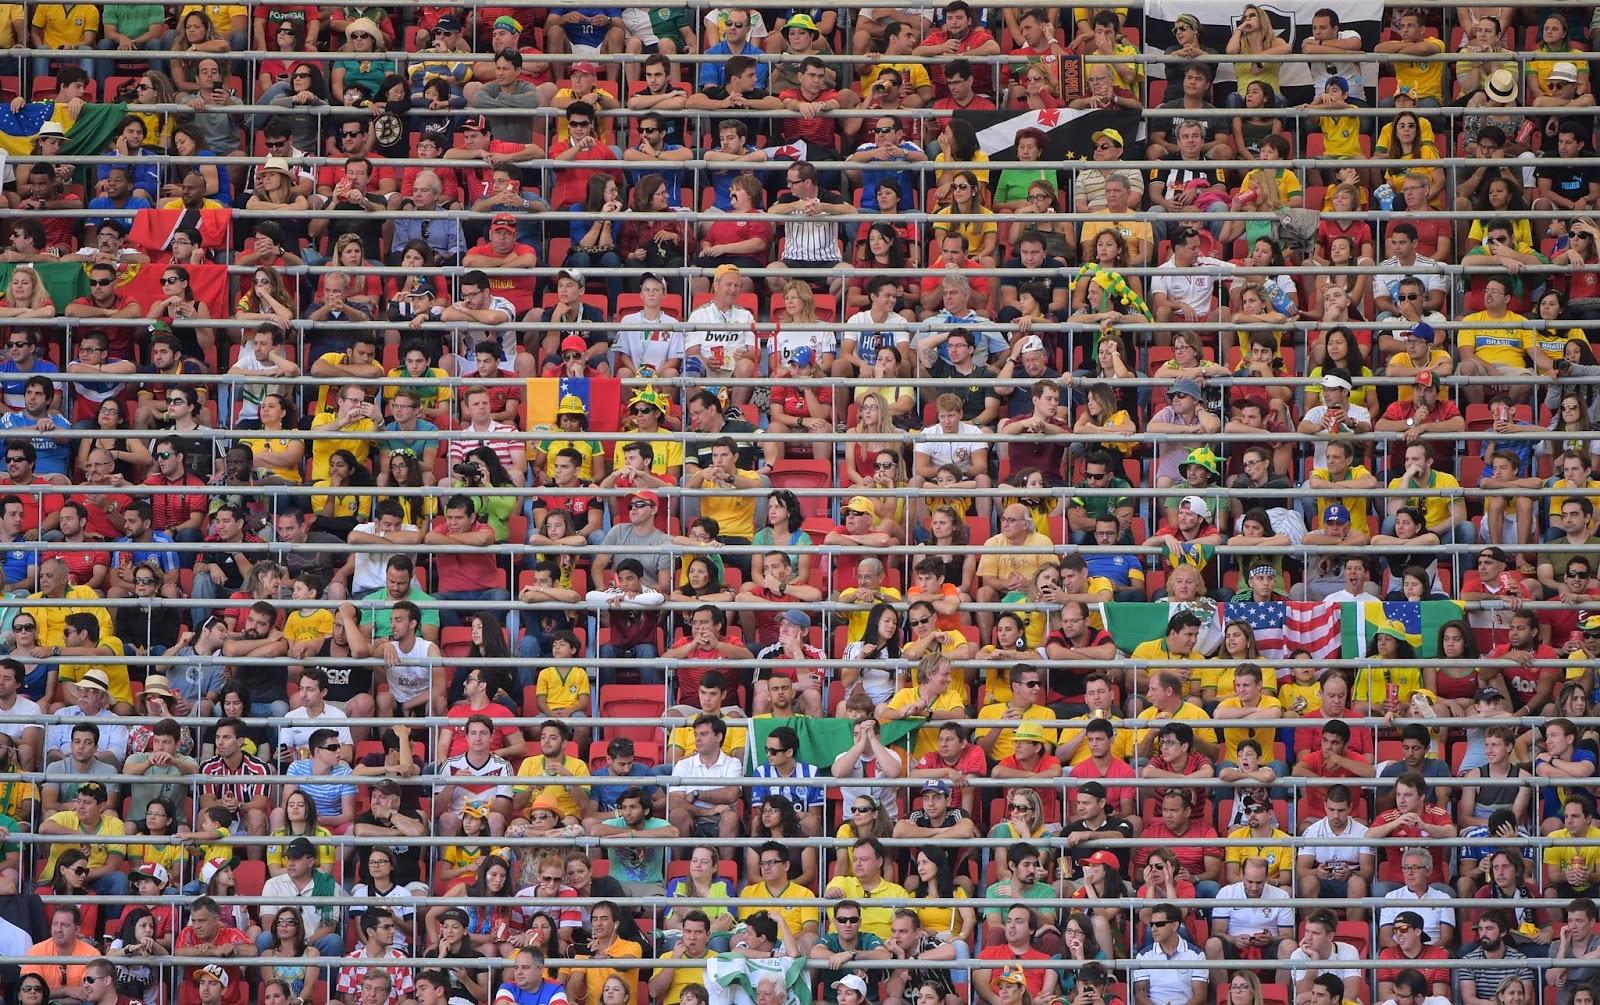 Brazil, CR7, Cristiano Ronaldo, FIFA World Cup, FIFA World Cup 2014, Football, Ghana Match, Portugal Match, Portugal vs Ghana, Sports, Jonathan Mensah, John Boye, Jonathan Mensah, Group G, Paulo Bento, Pepe,